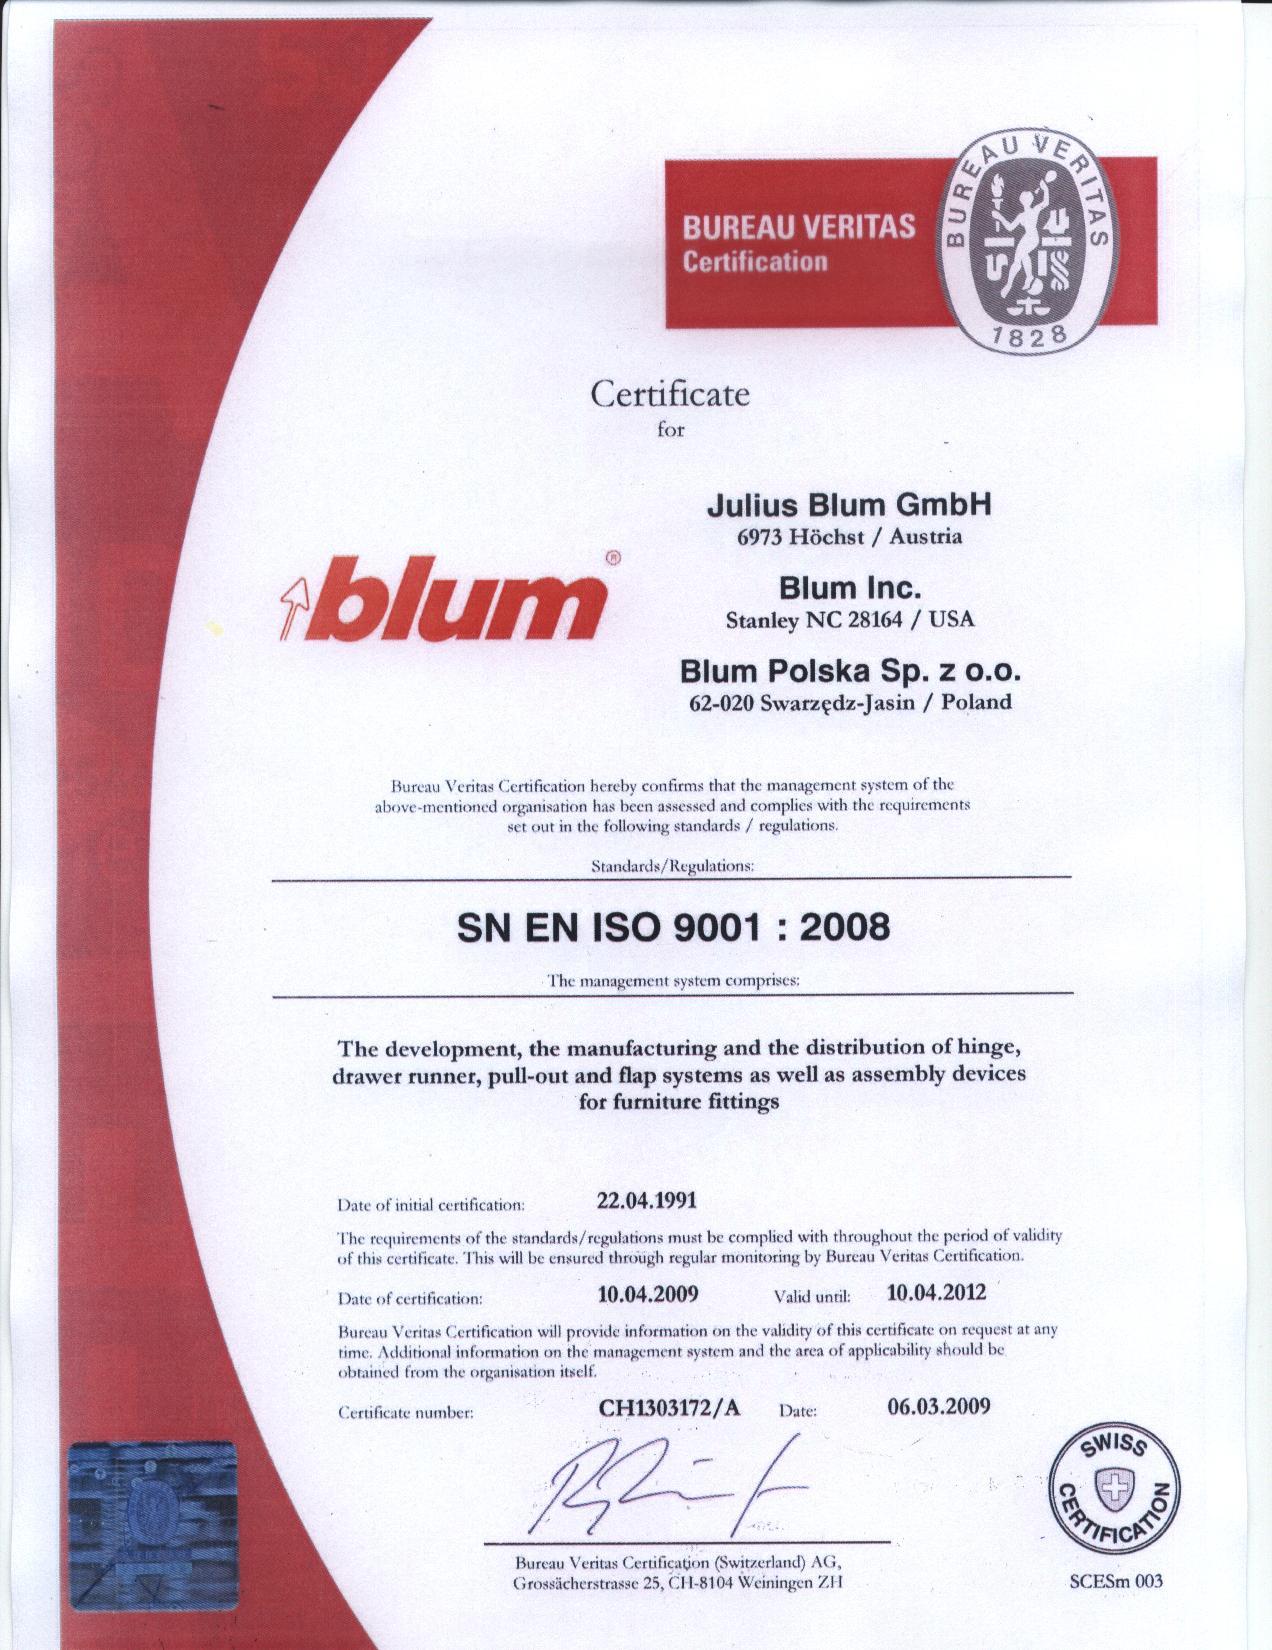 Blum iso 9001